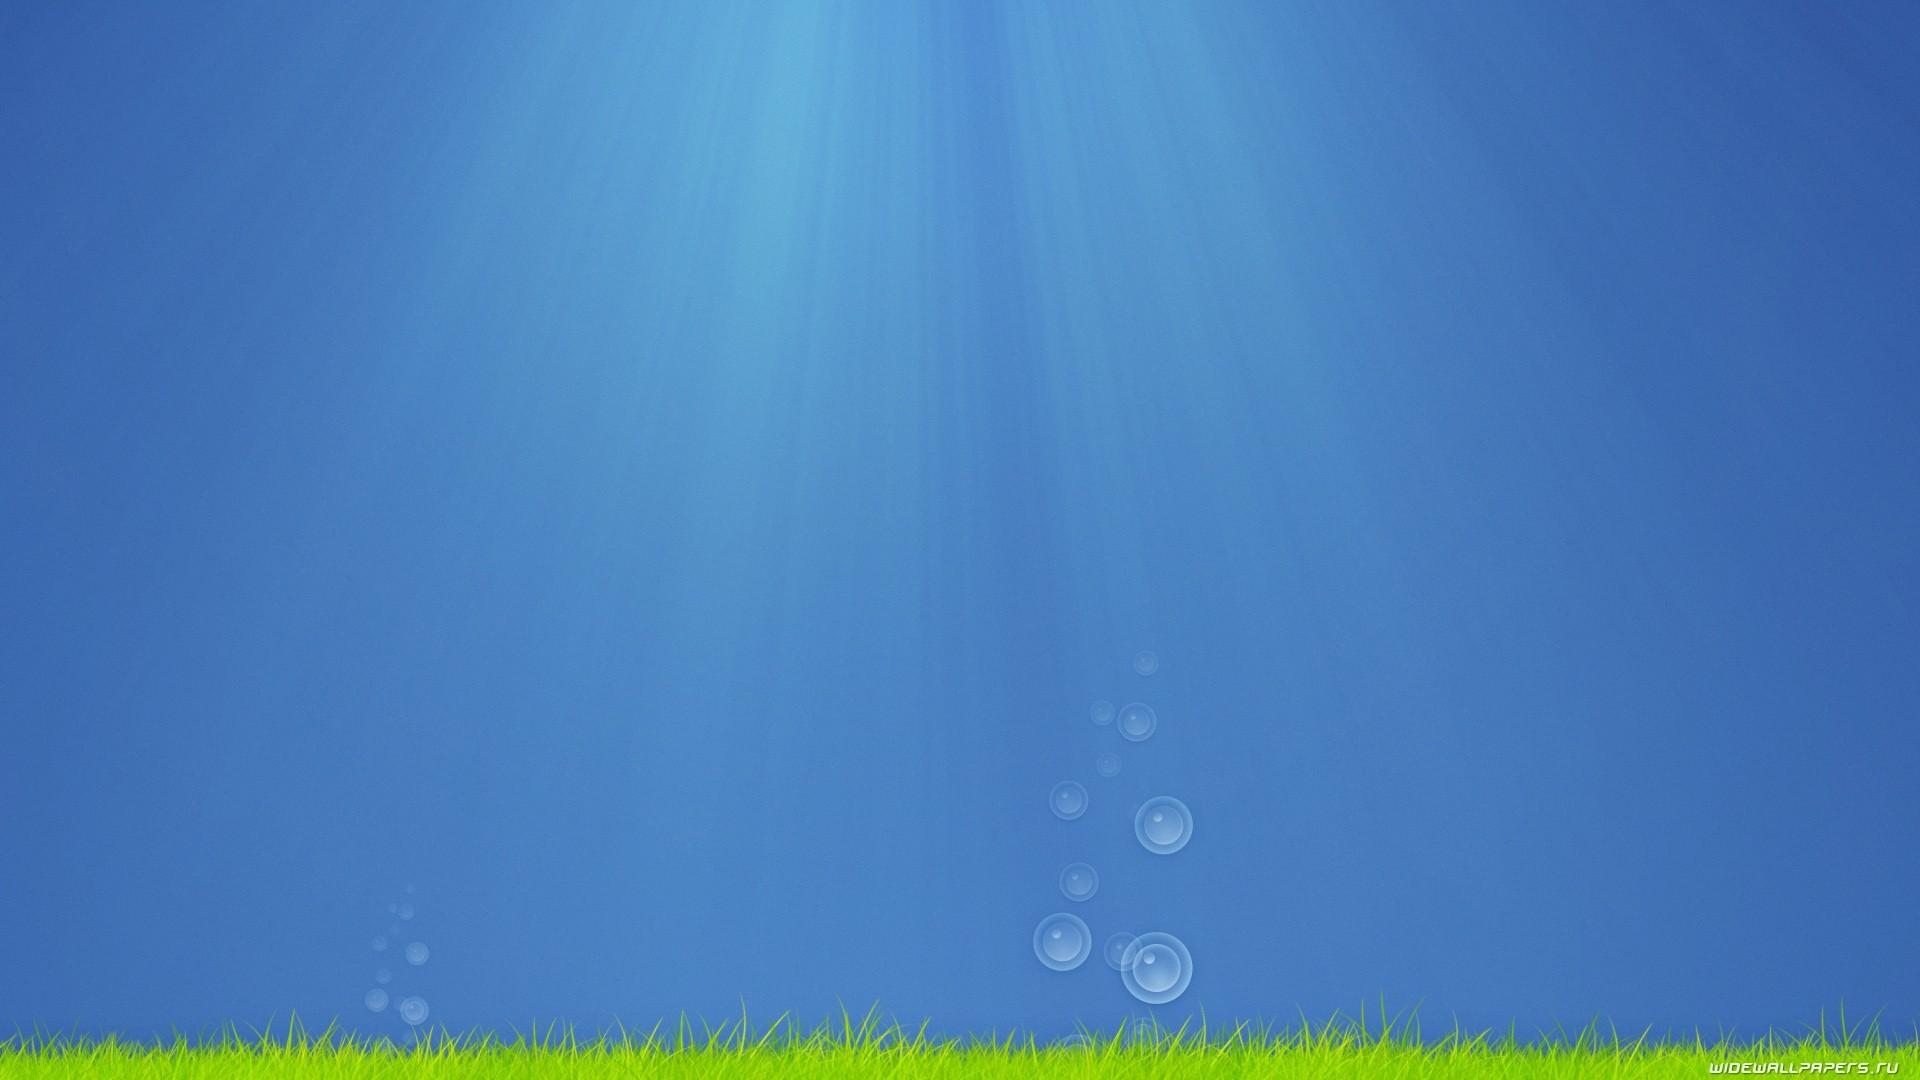 Water Minimalist Desktop wallpaper